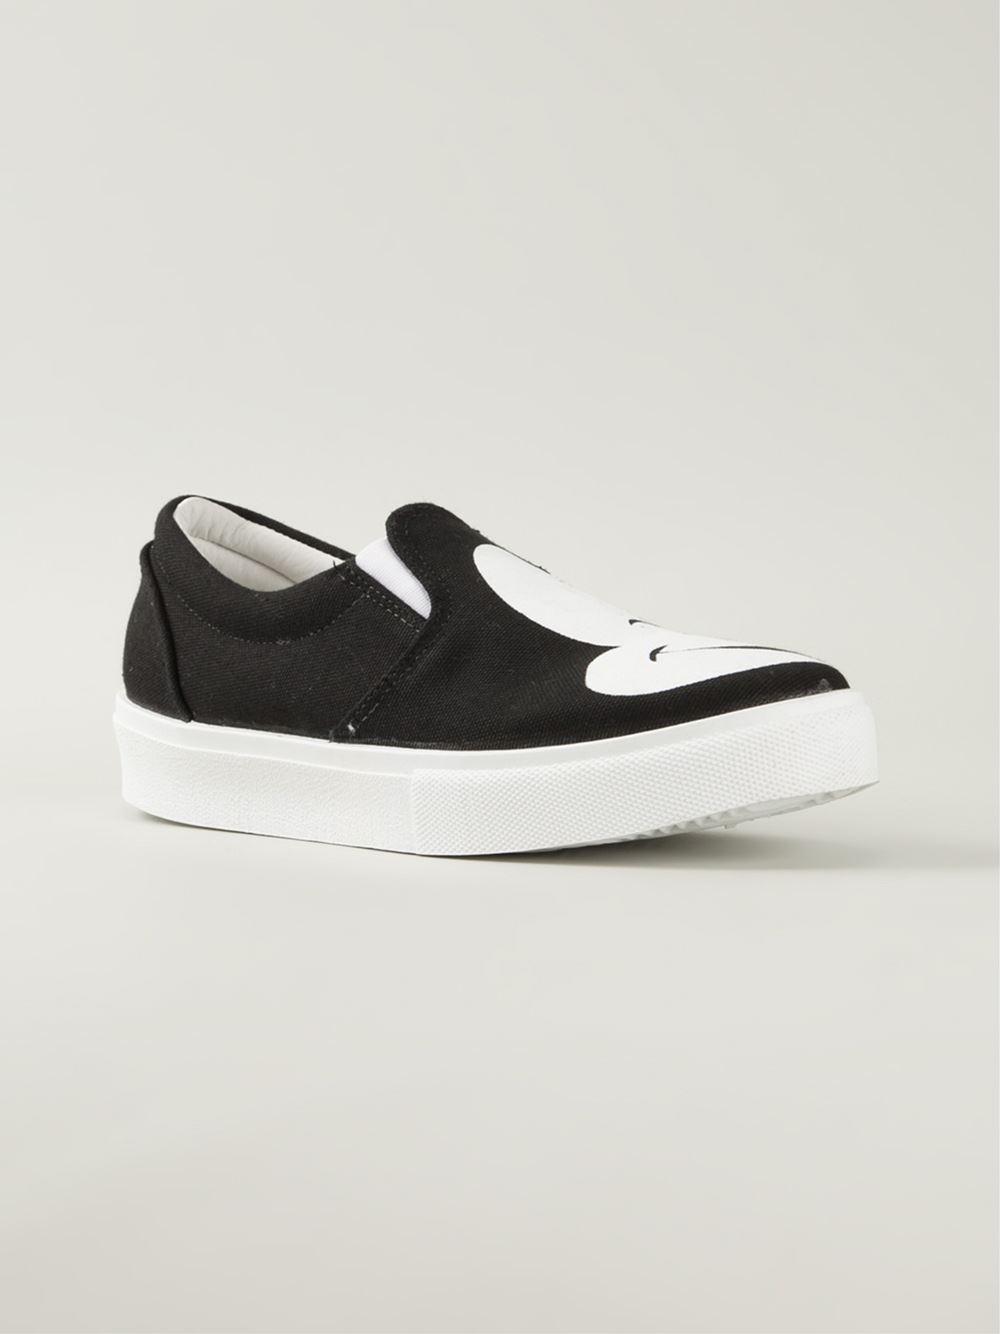 Chiara ferragni Mickey Mouse Print Slip-On Sneakers in ...